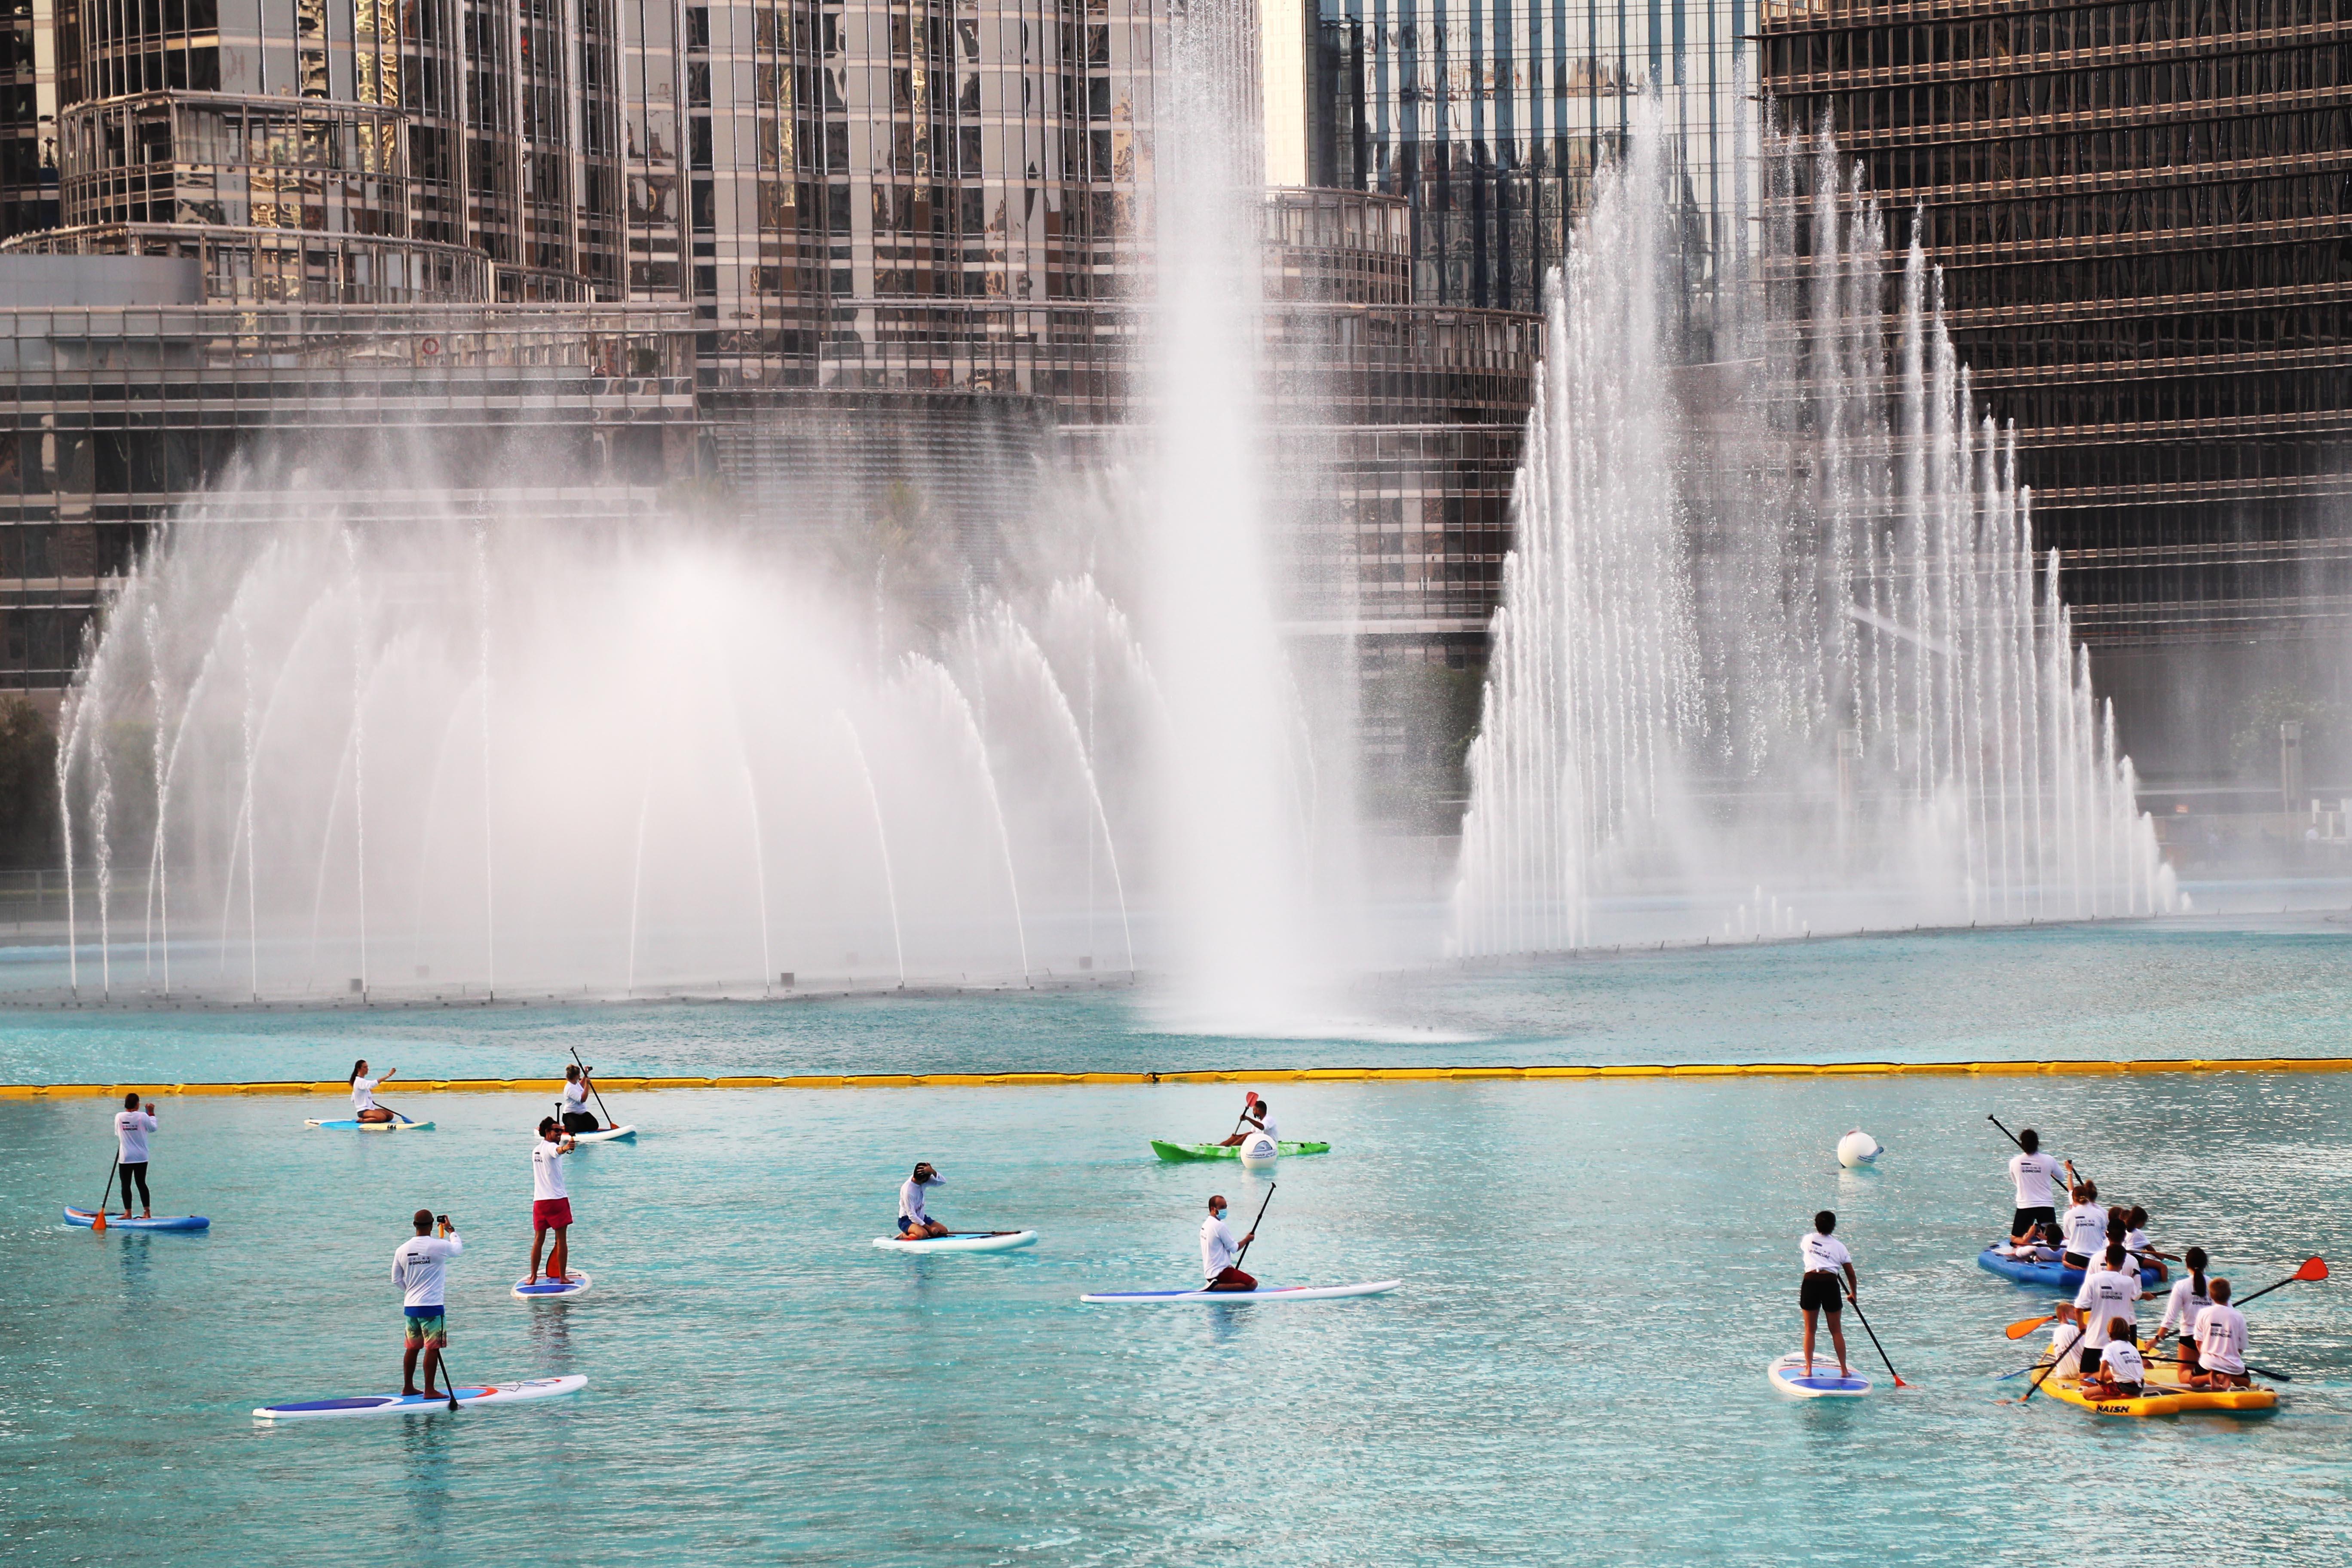 22 Events for Dubai International Marine Club this 2020